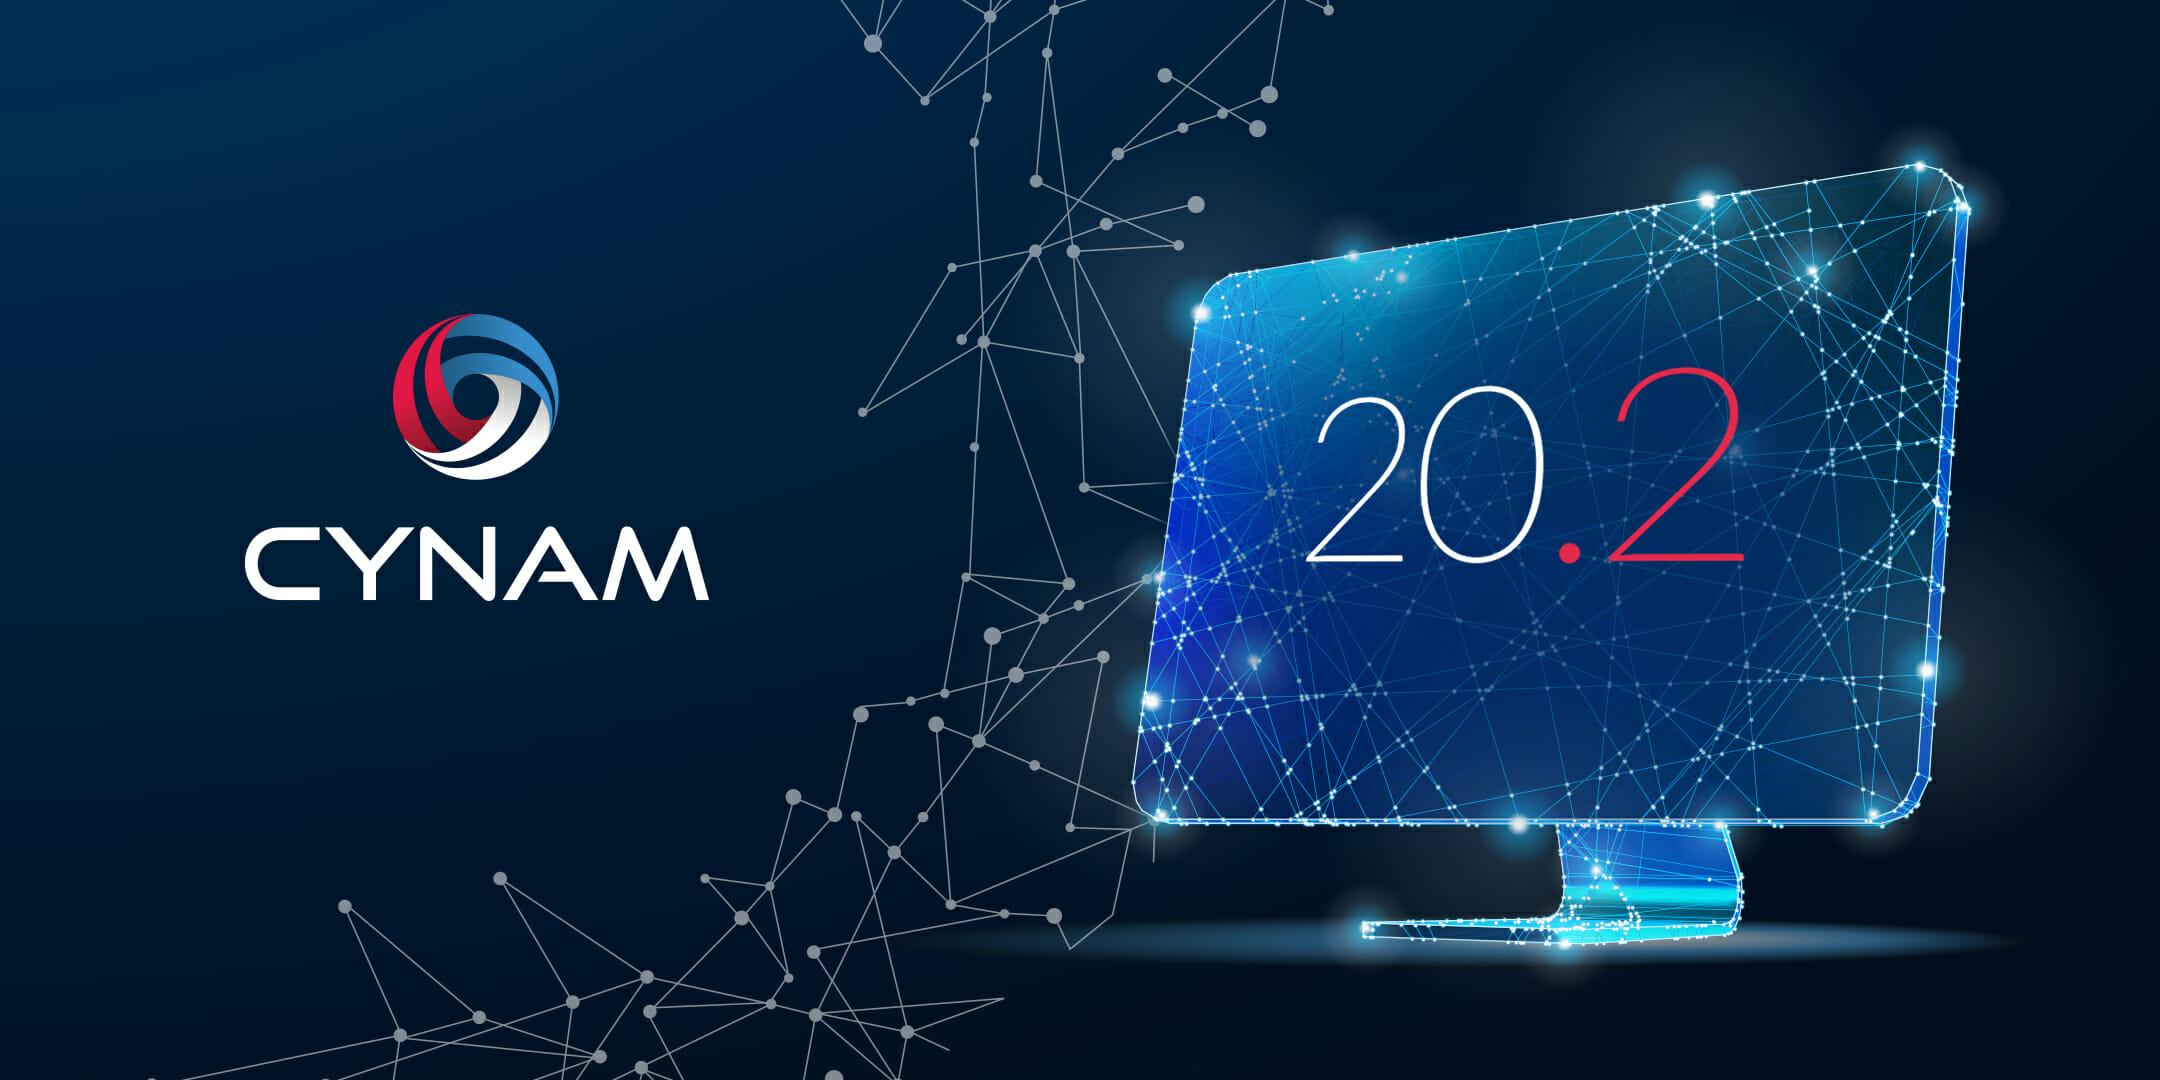 Cynam 20.2 image